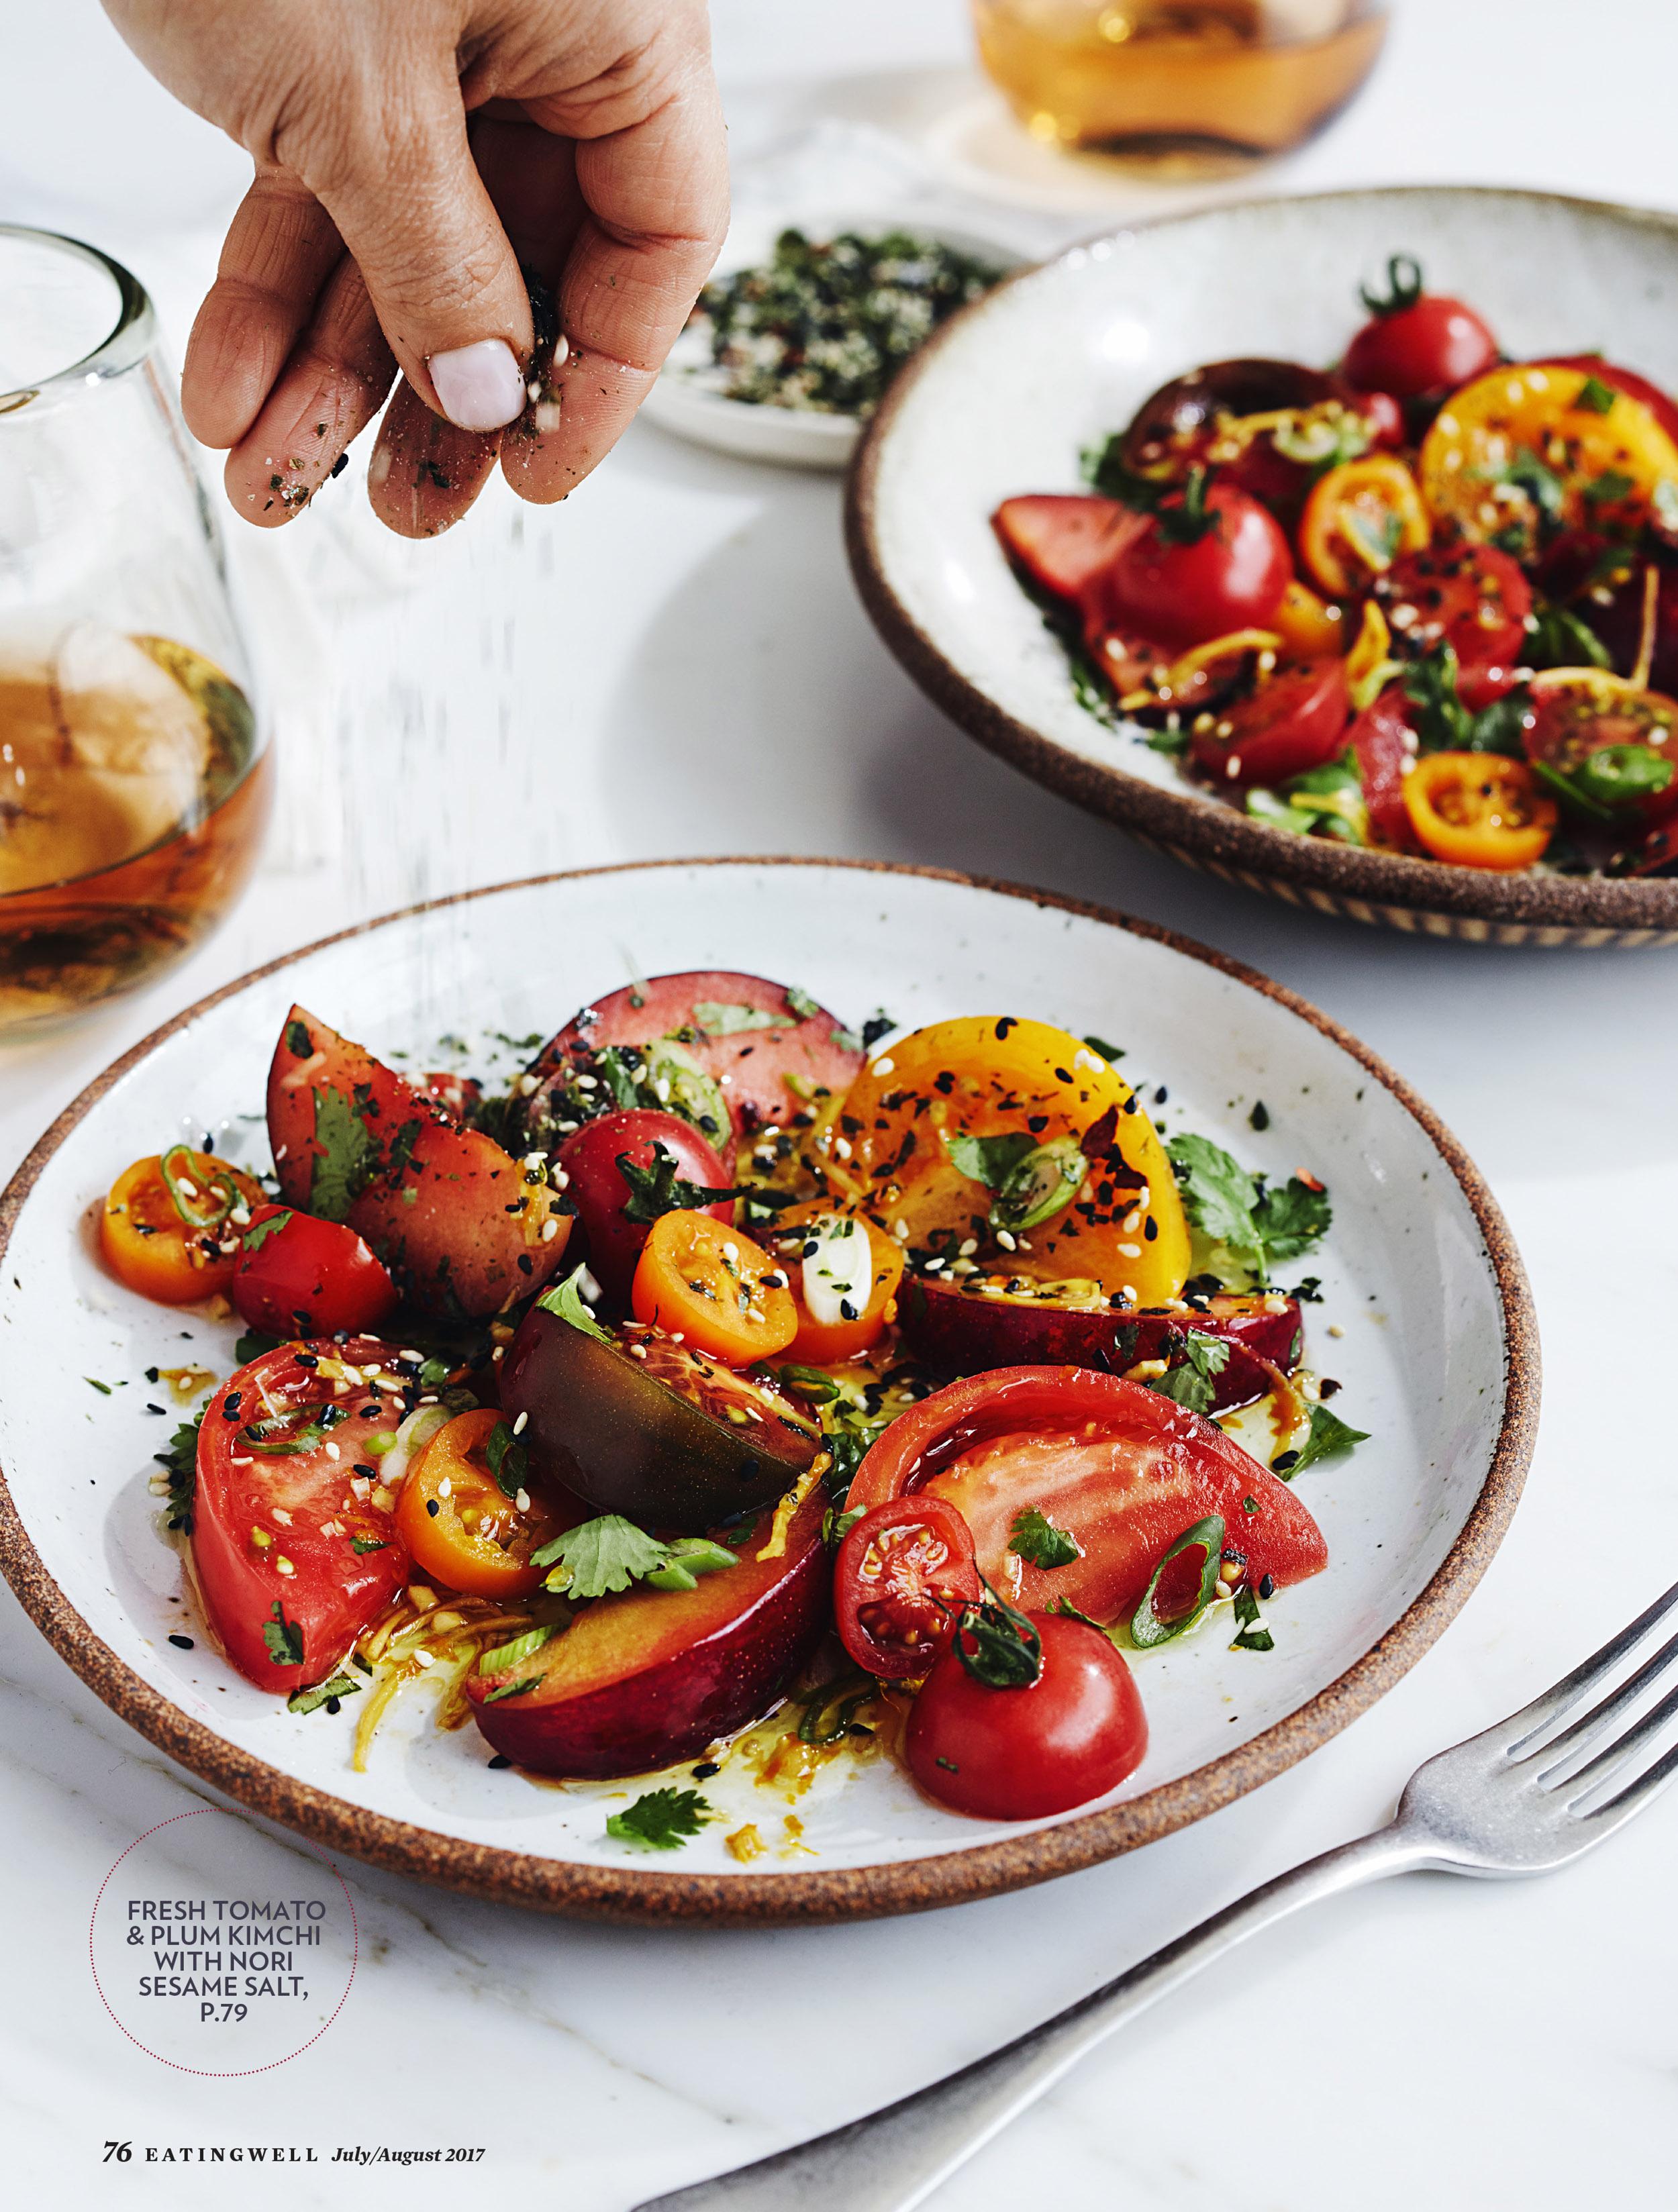 074-079 EW_JA17_feature_Fruit Salads QFCCcx-3 copy.jpg